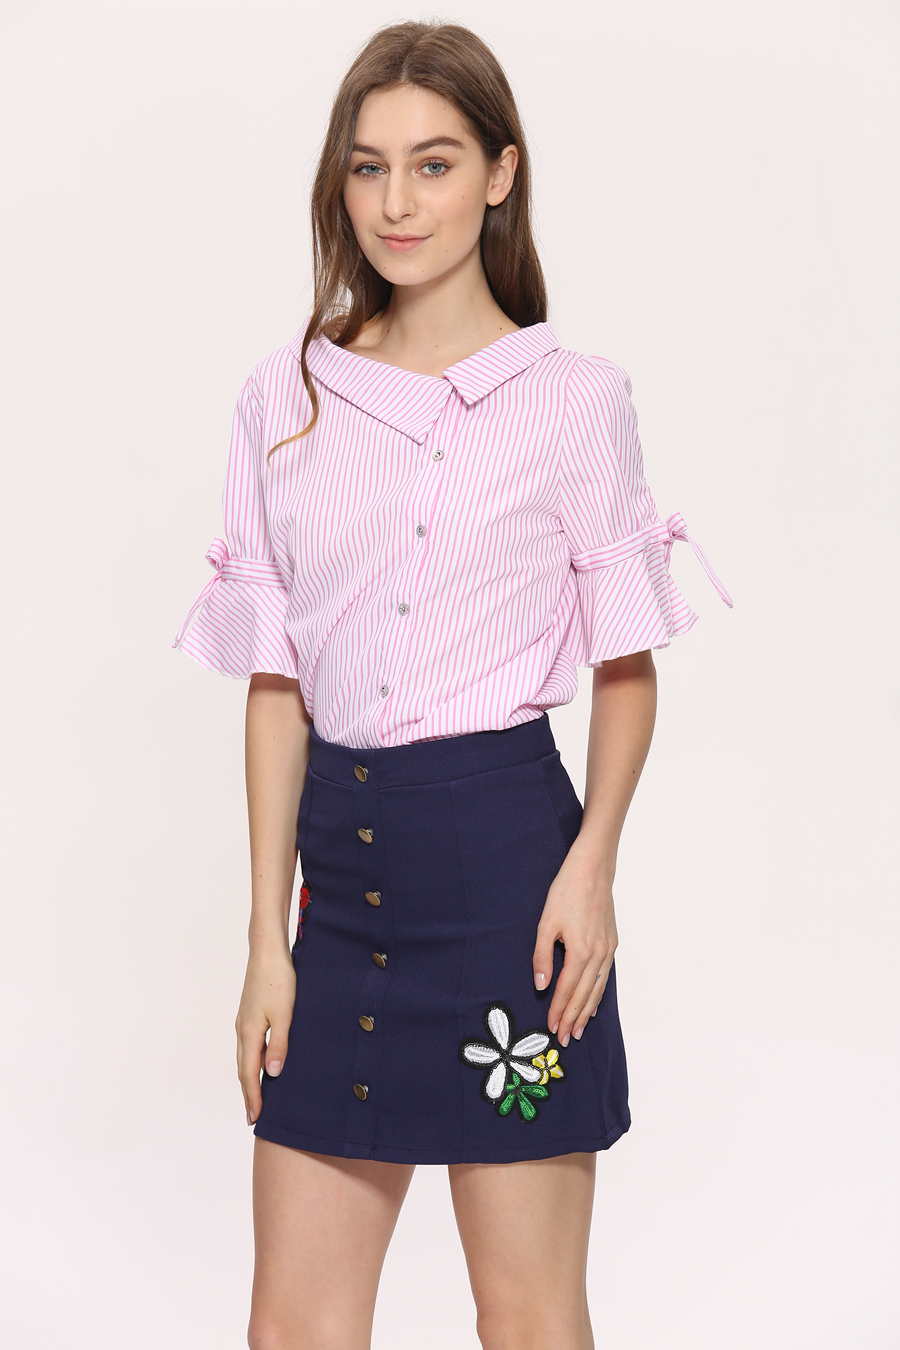 23d346750 Novelty Blouses Shirts Women Striped Blouses 2018 New Stylish Sailor ...